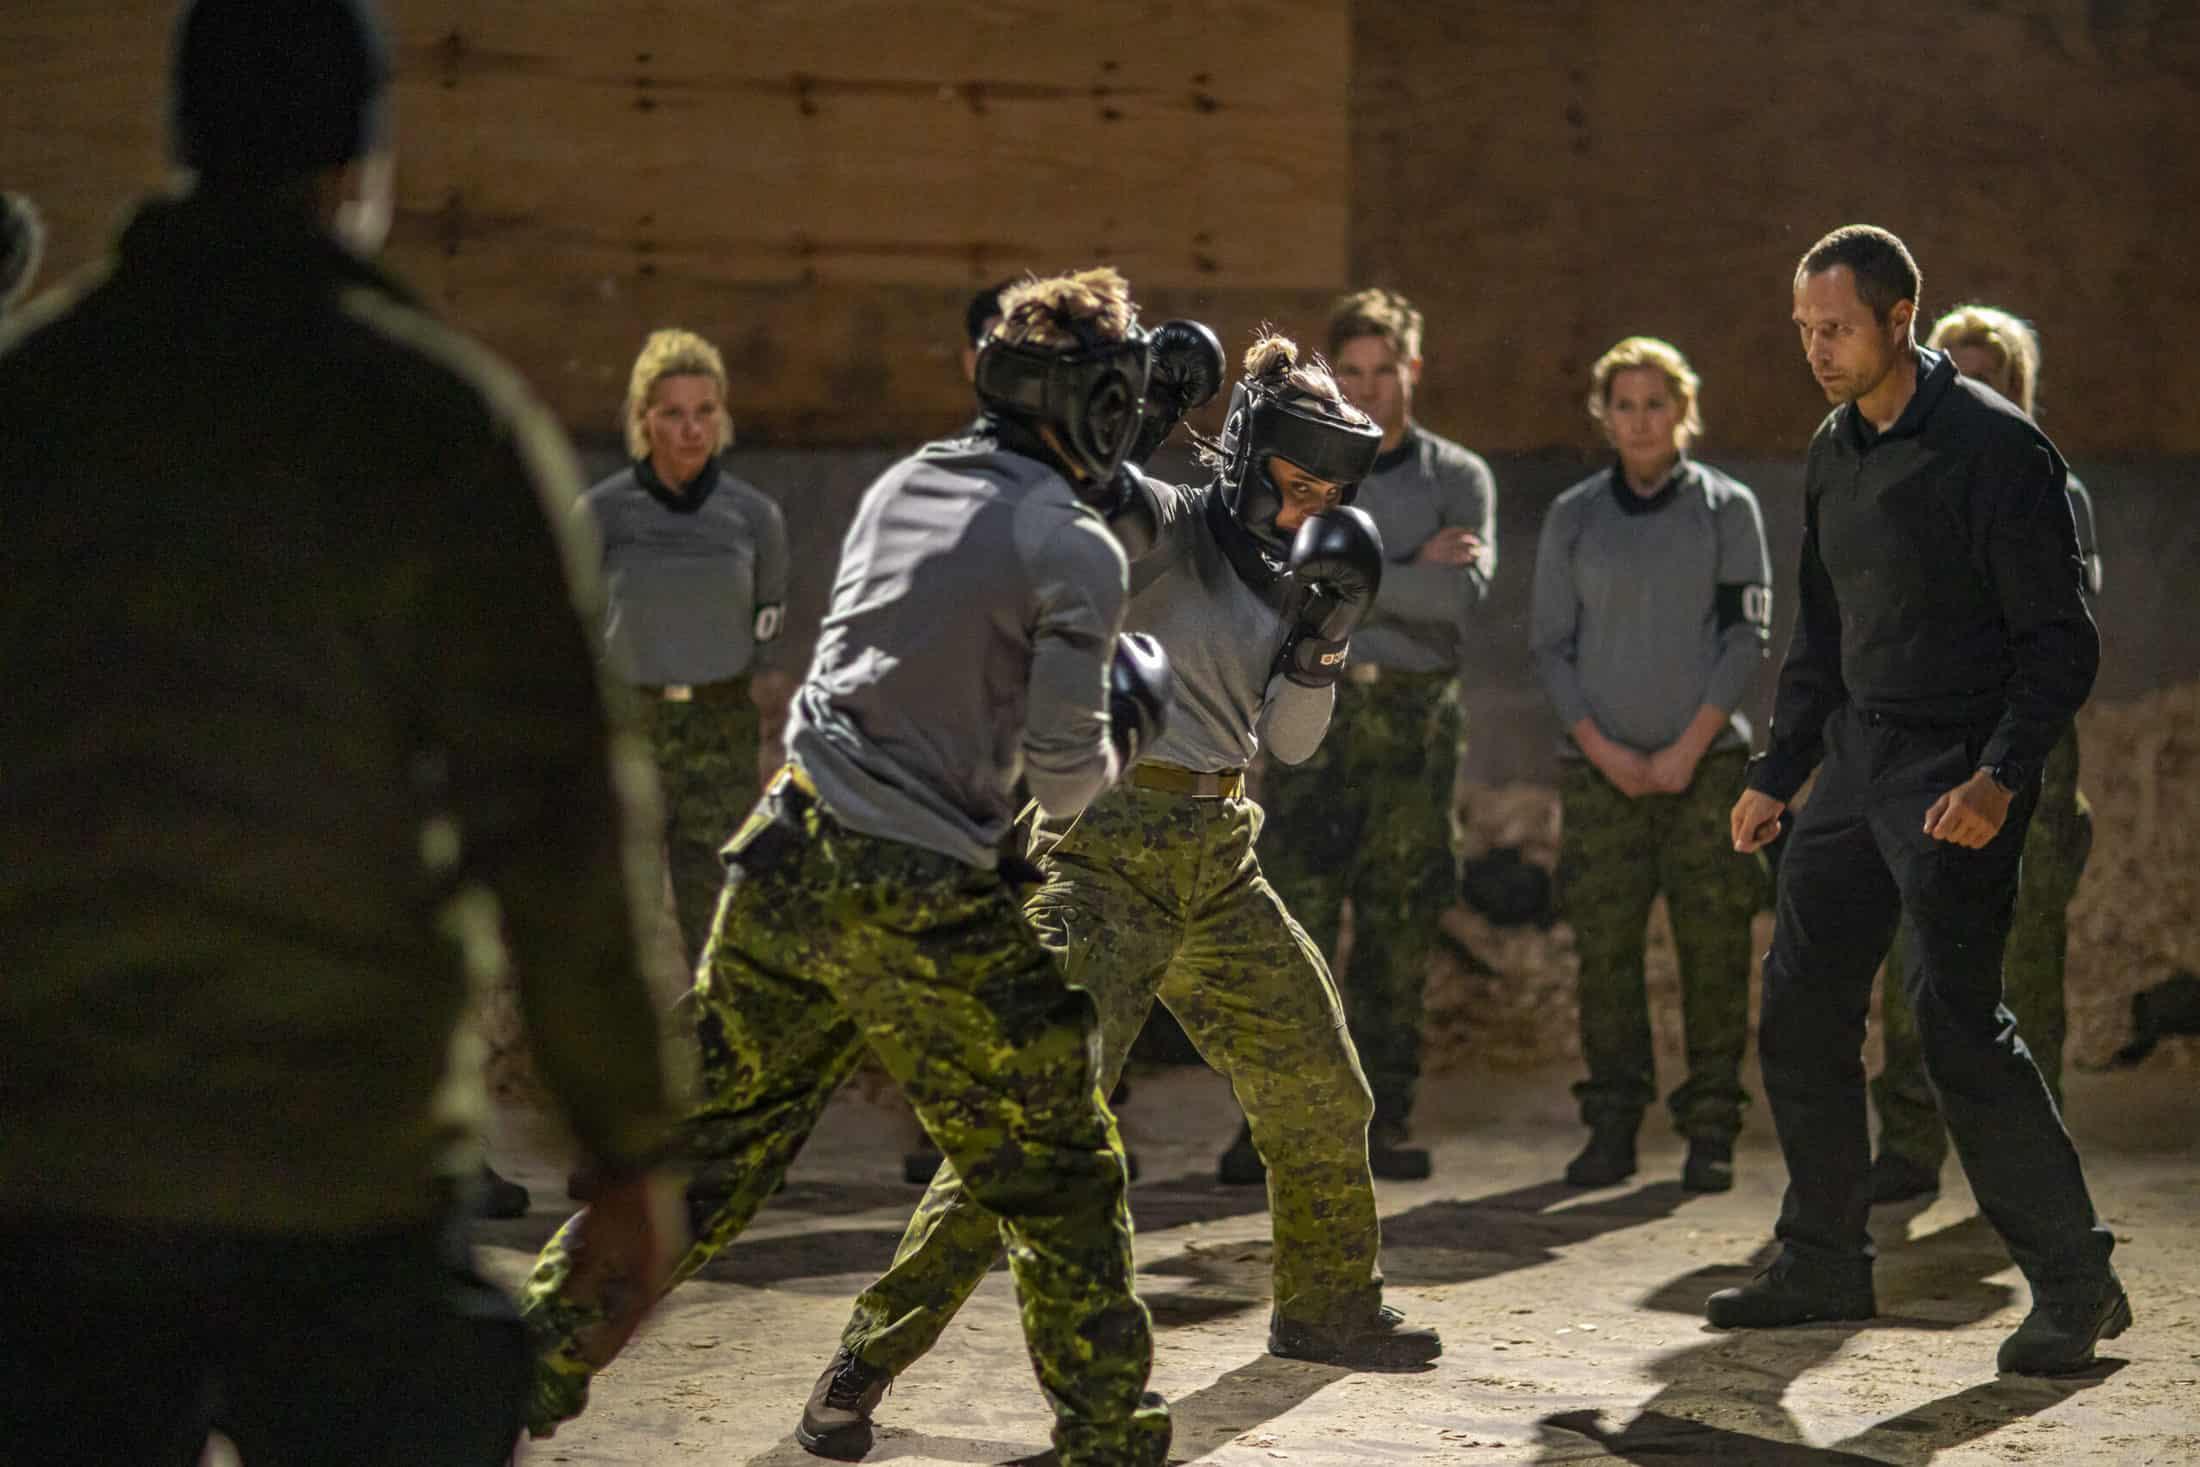 Episode 1, Korpset, sæson 4, boksning, instruktør Erik B. Jørgensen er kampdommer